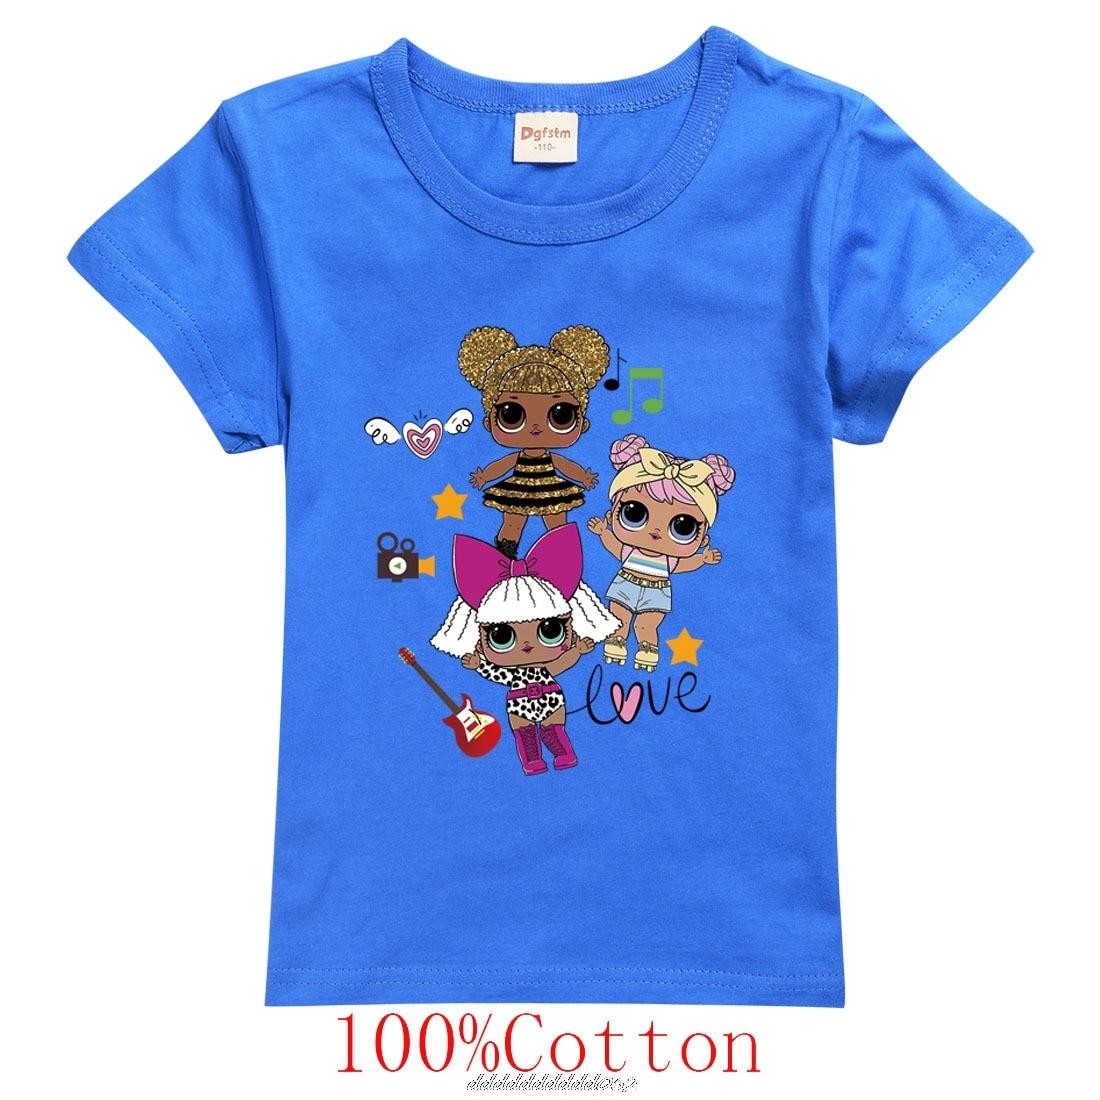 LOL SURPRISE Kids Clothes Girls 3-14 Teenage Cotton Graphic Tees Kids Clothing Teen Girls Tshirt Little Boys Shirt Child Tops